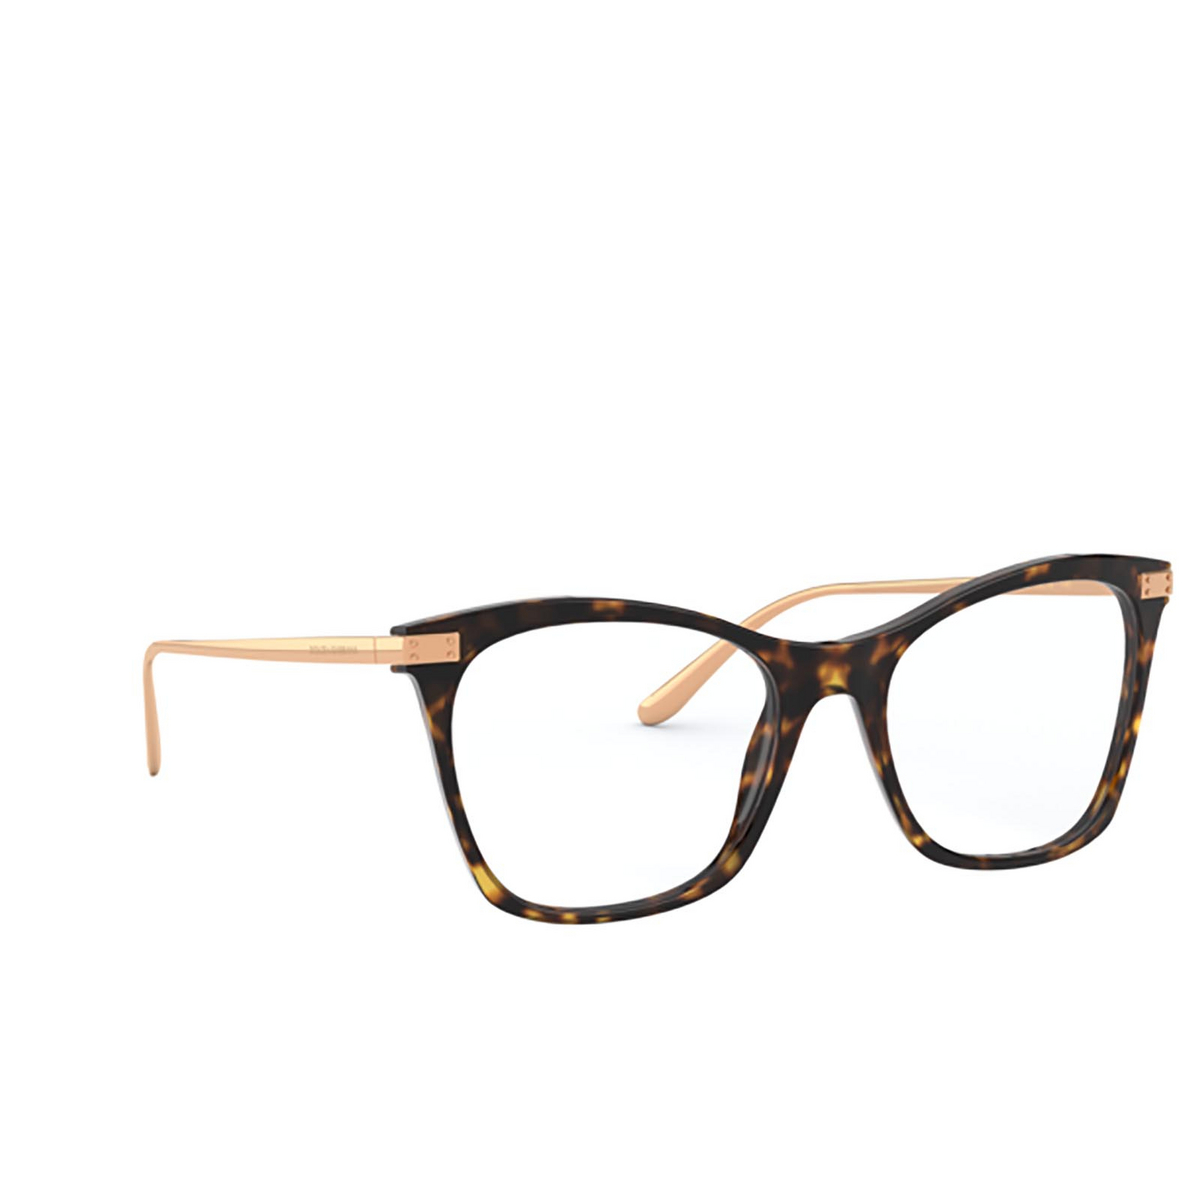 Dolce & Gabbana® Square Eyeglasses: DG3331 color Havana 502 - three-quarters view.